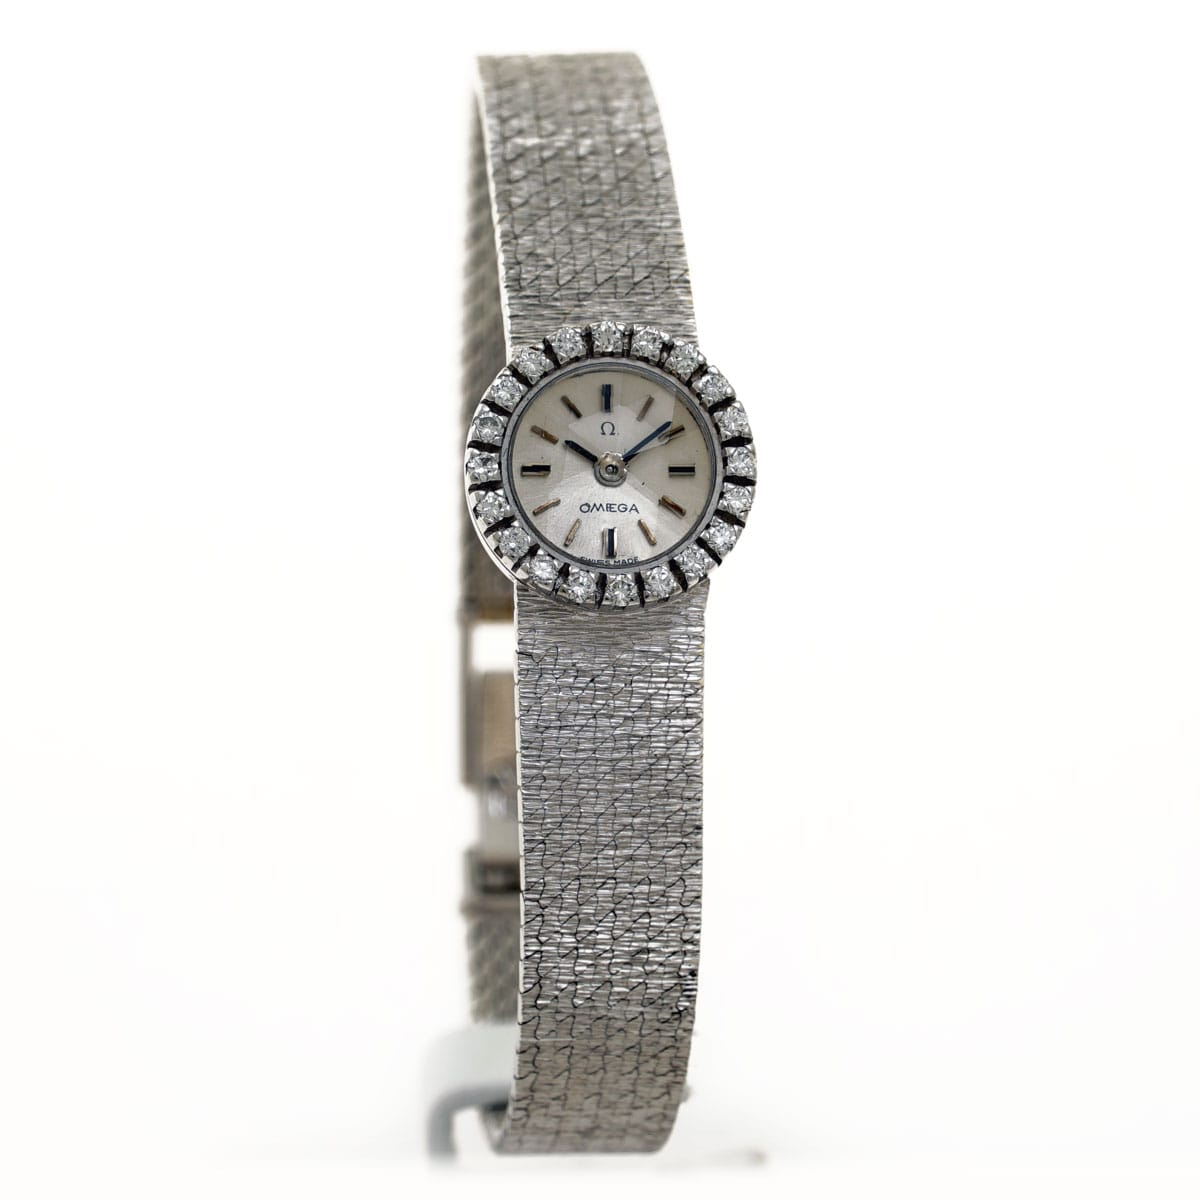 108826-Omega-Vintage-féminine-montres-occasion-seconde-main-lionel-meylan-vevey